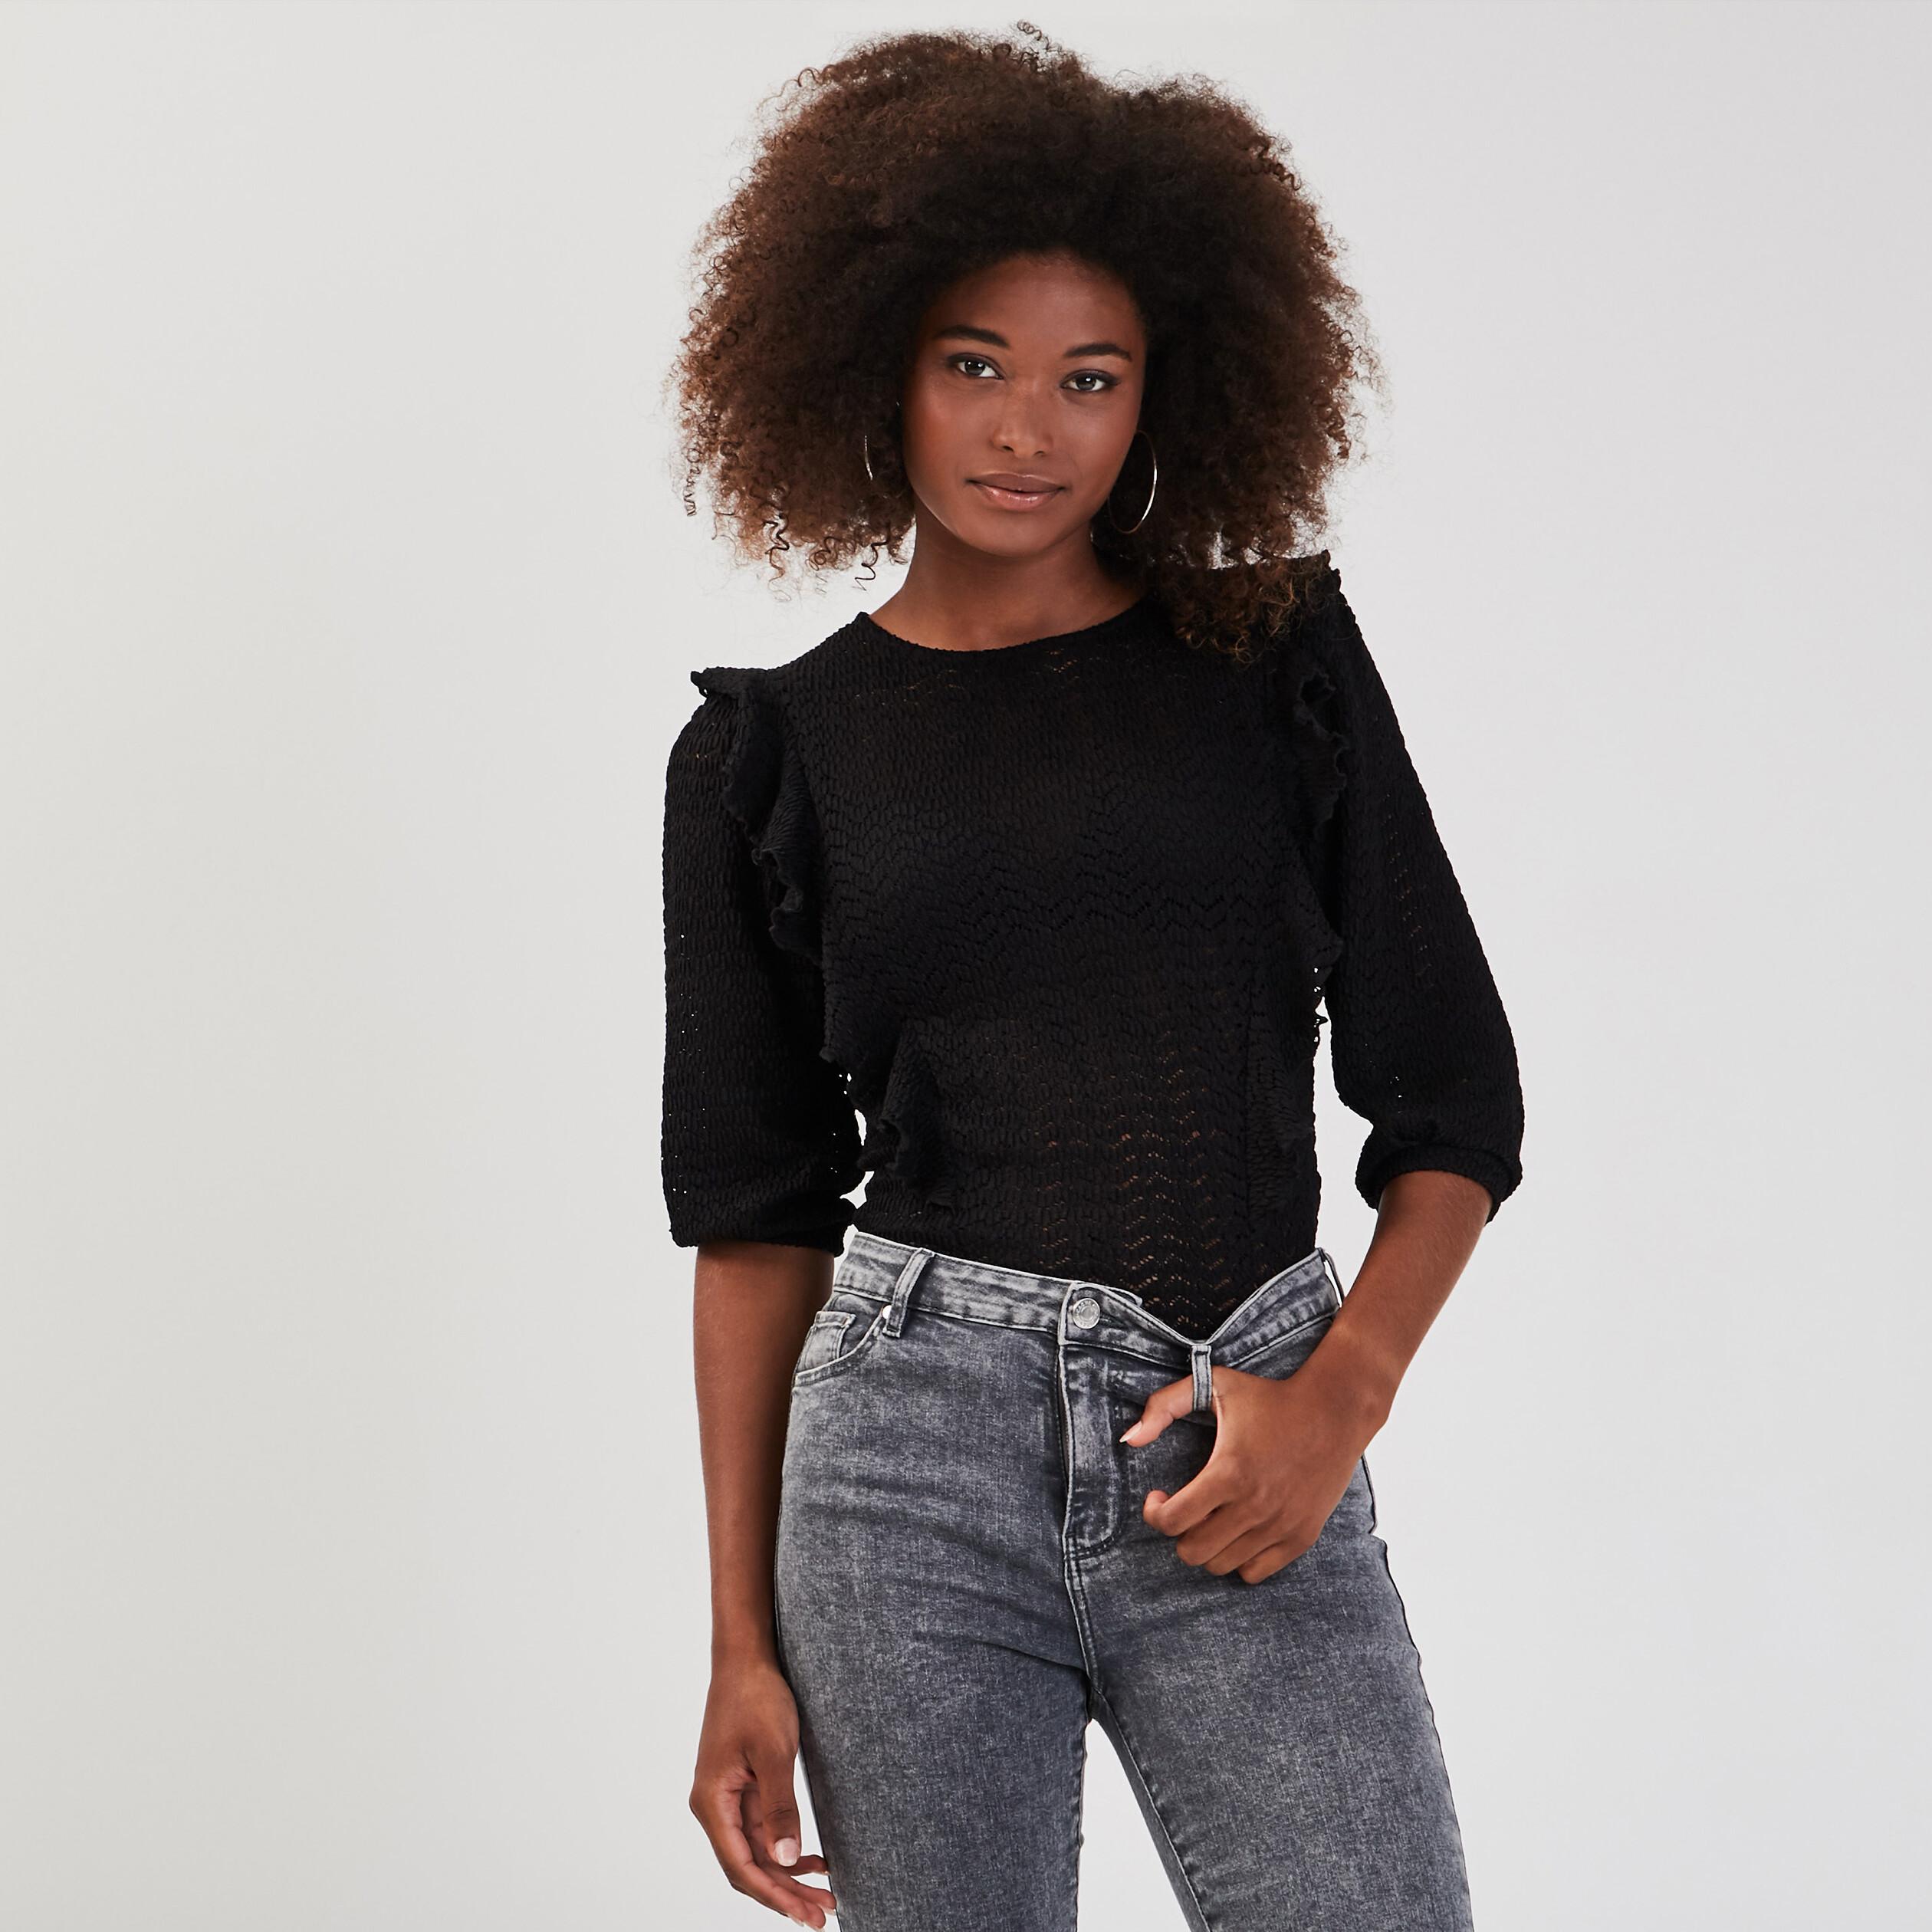 Vivance Femmes Shirt Viscose Chemise Taille 34 à 40 noir 770 avec dentelle NEUF